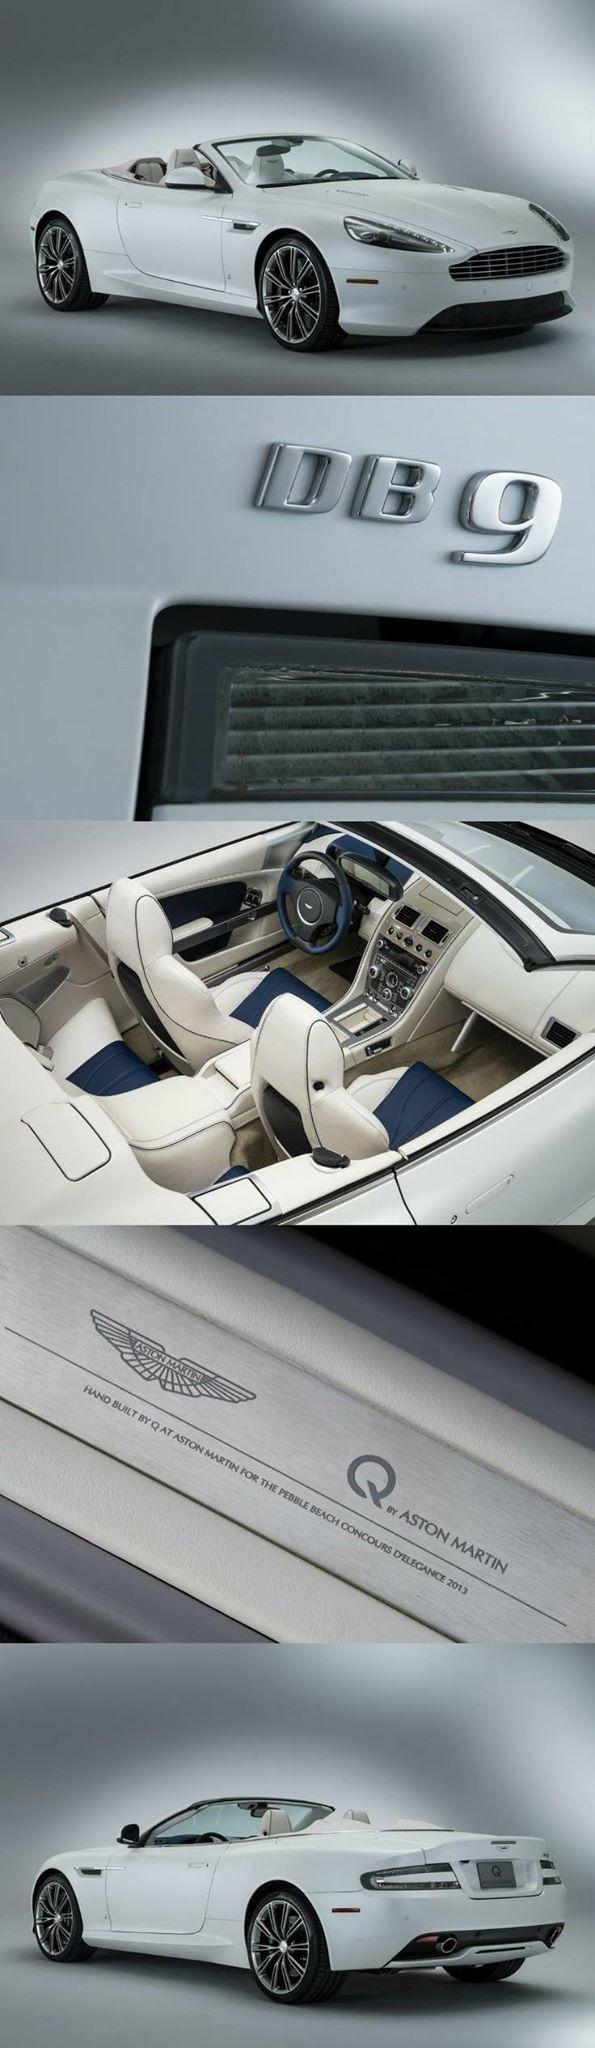 Aston Martin DB9 Q by Aston Martin